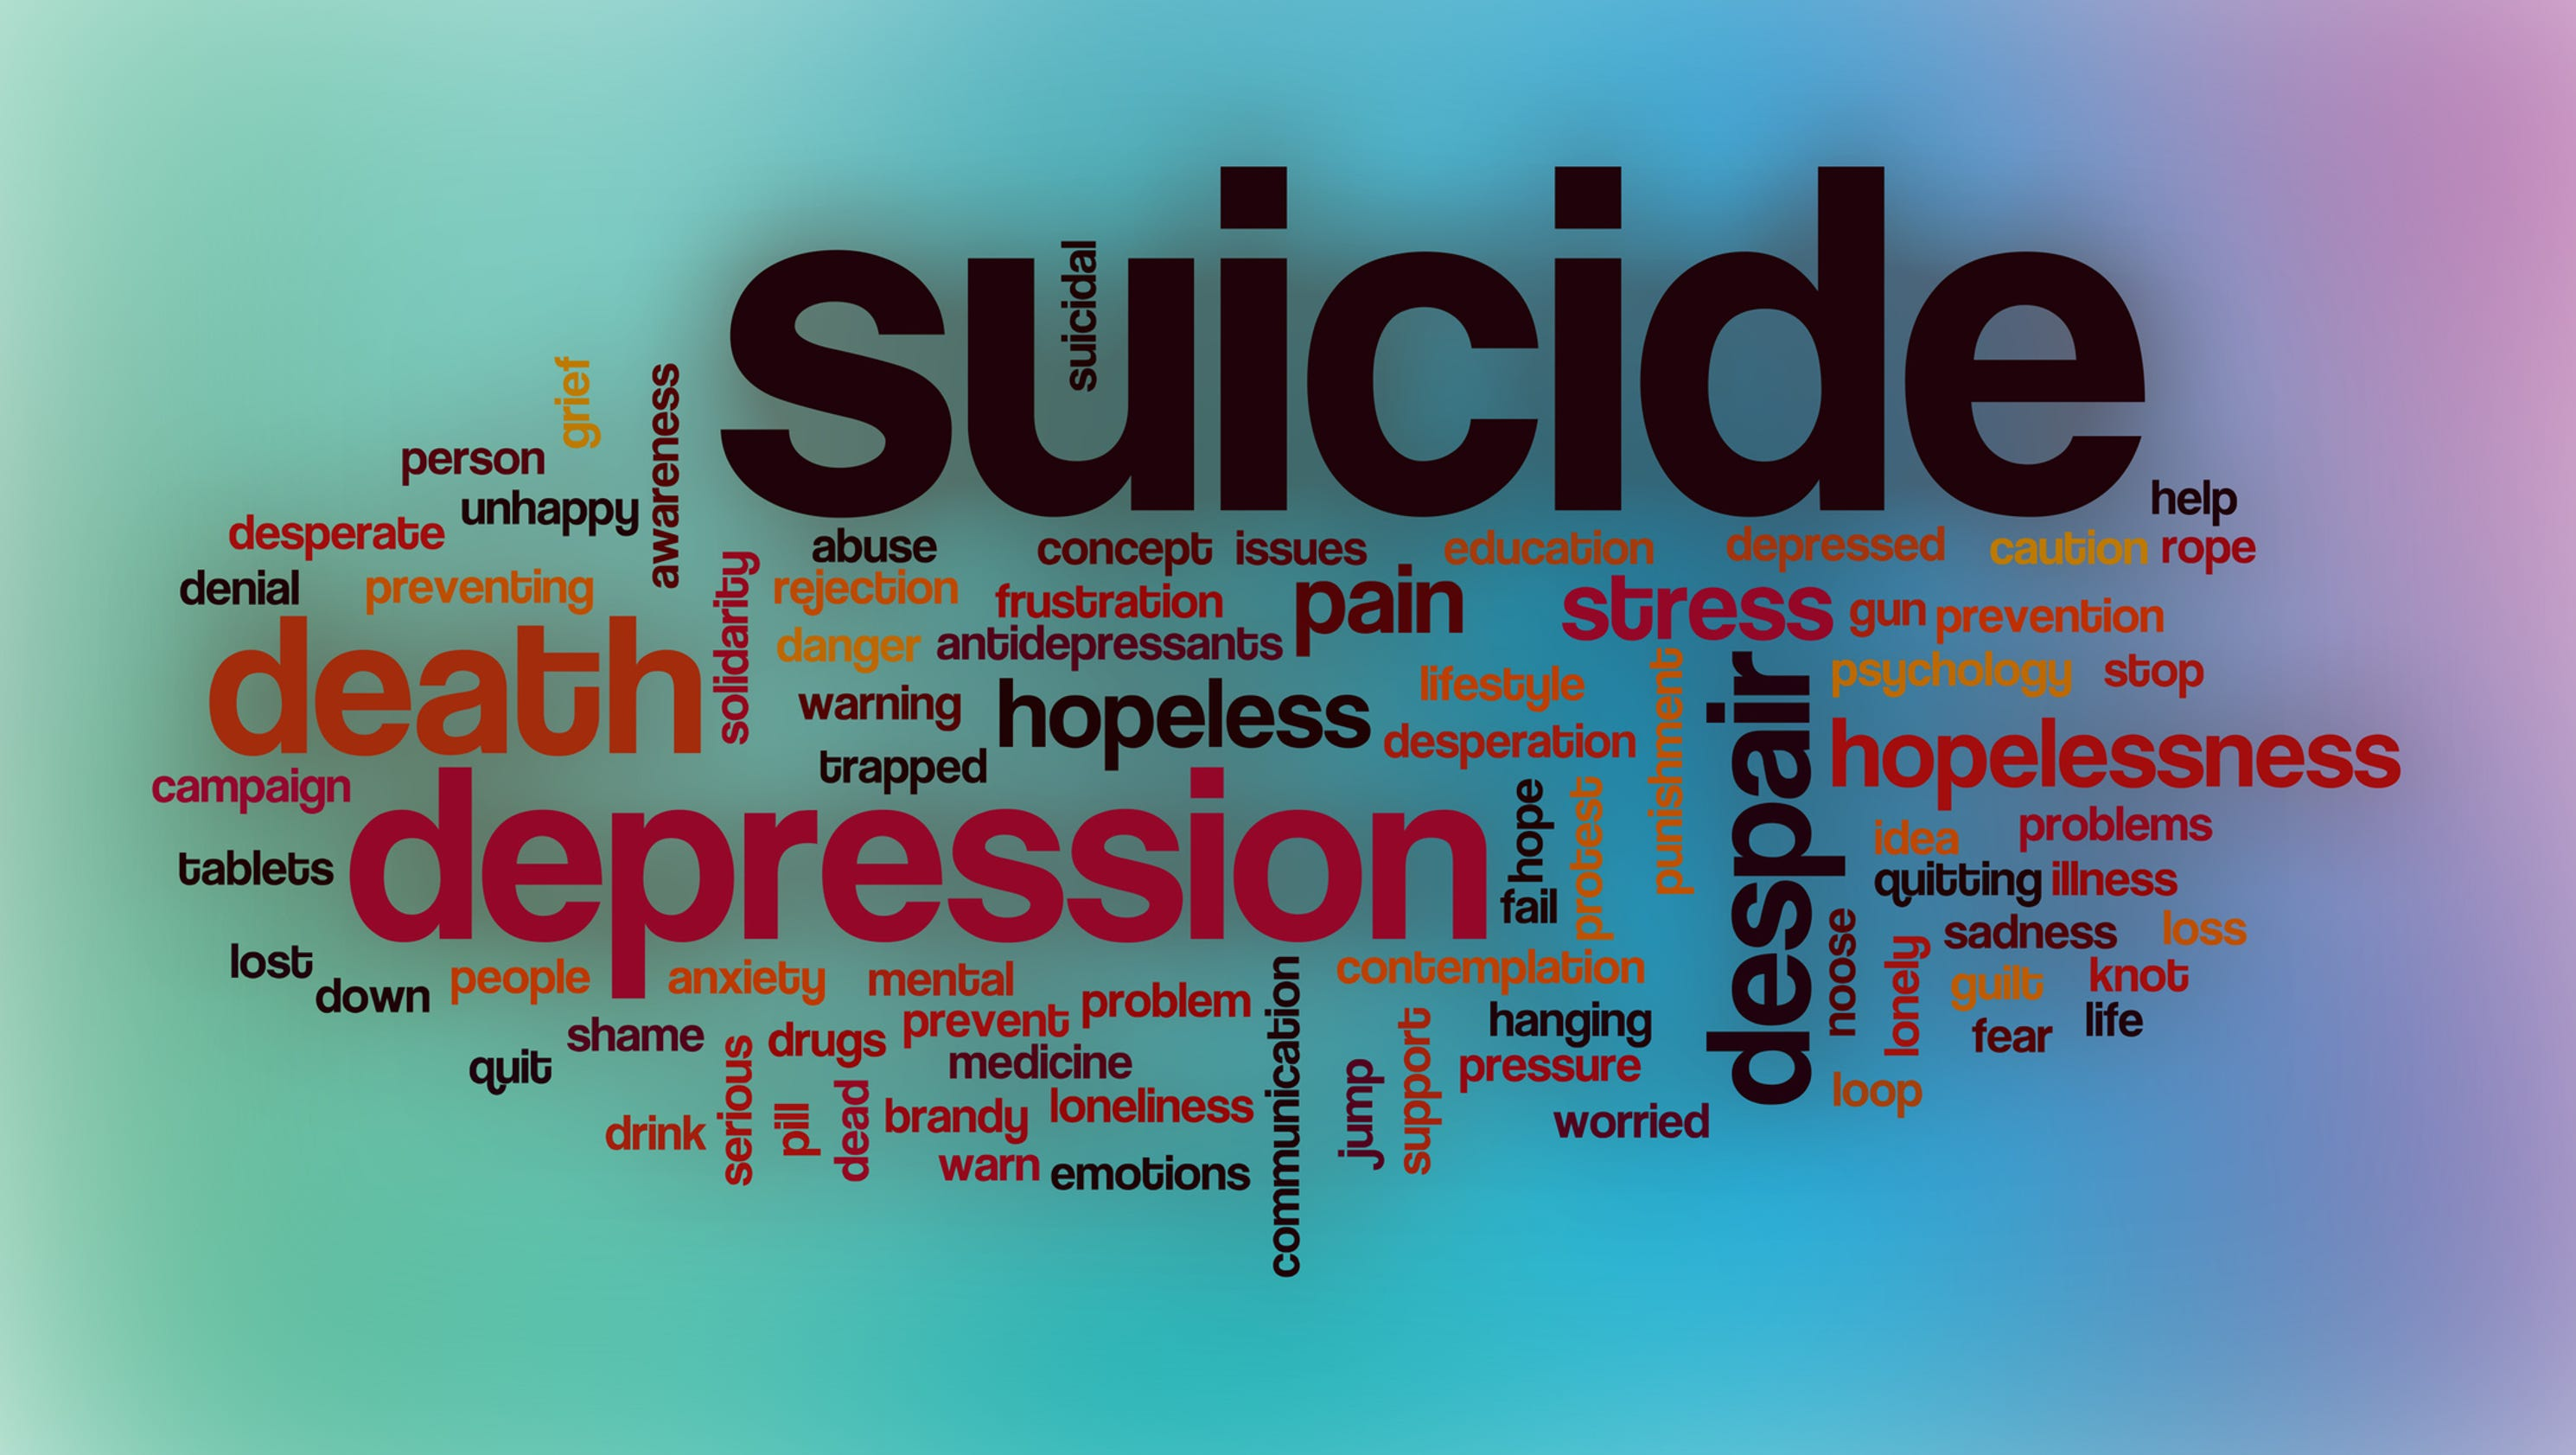 how to help prevent teenage suicide